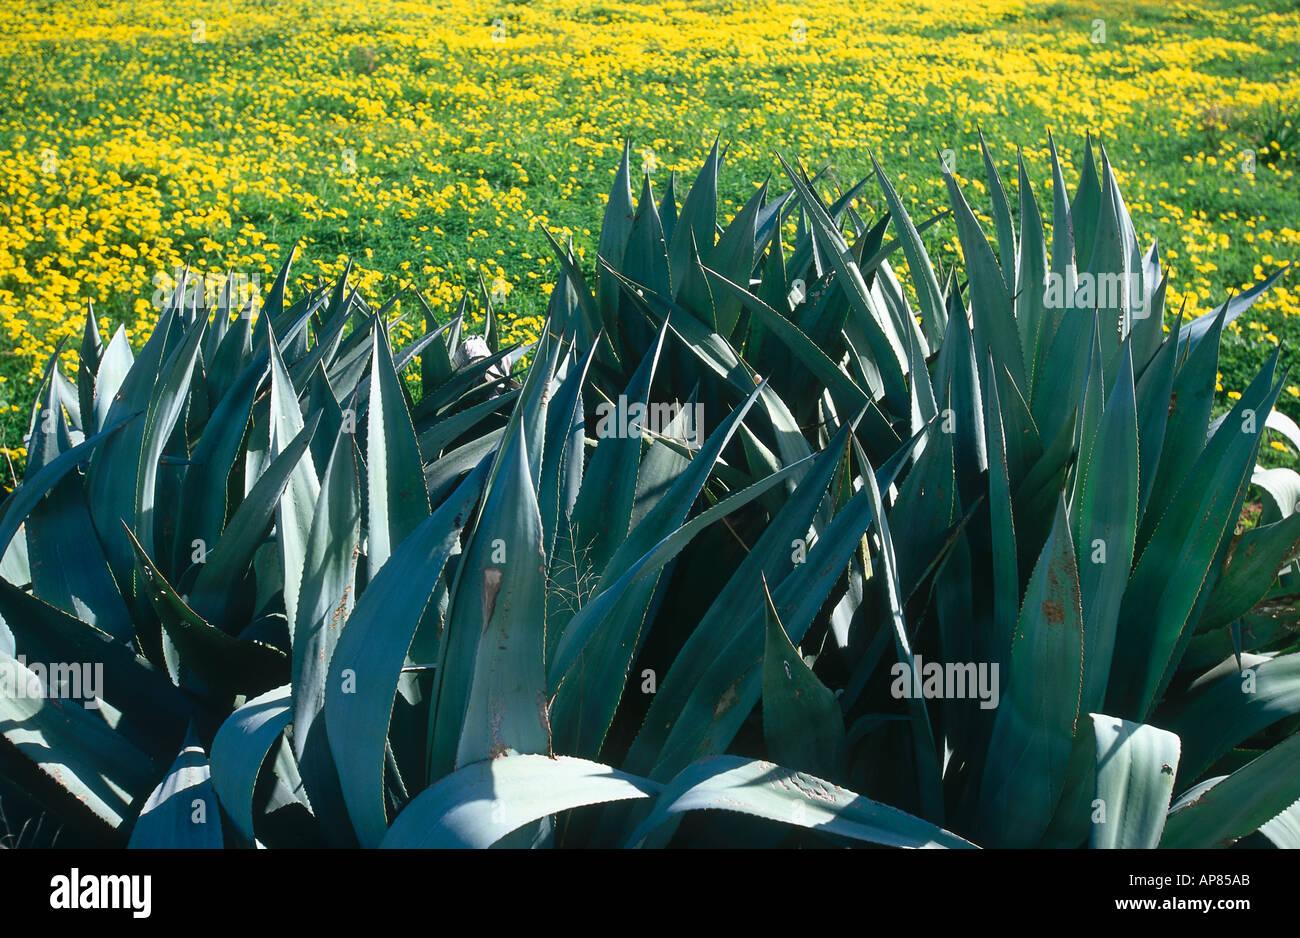 Agrave Pflanzen wachsen im Feld Mallorca Balearen Spanien Stockfoto Bild 1476010  Alamy